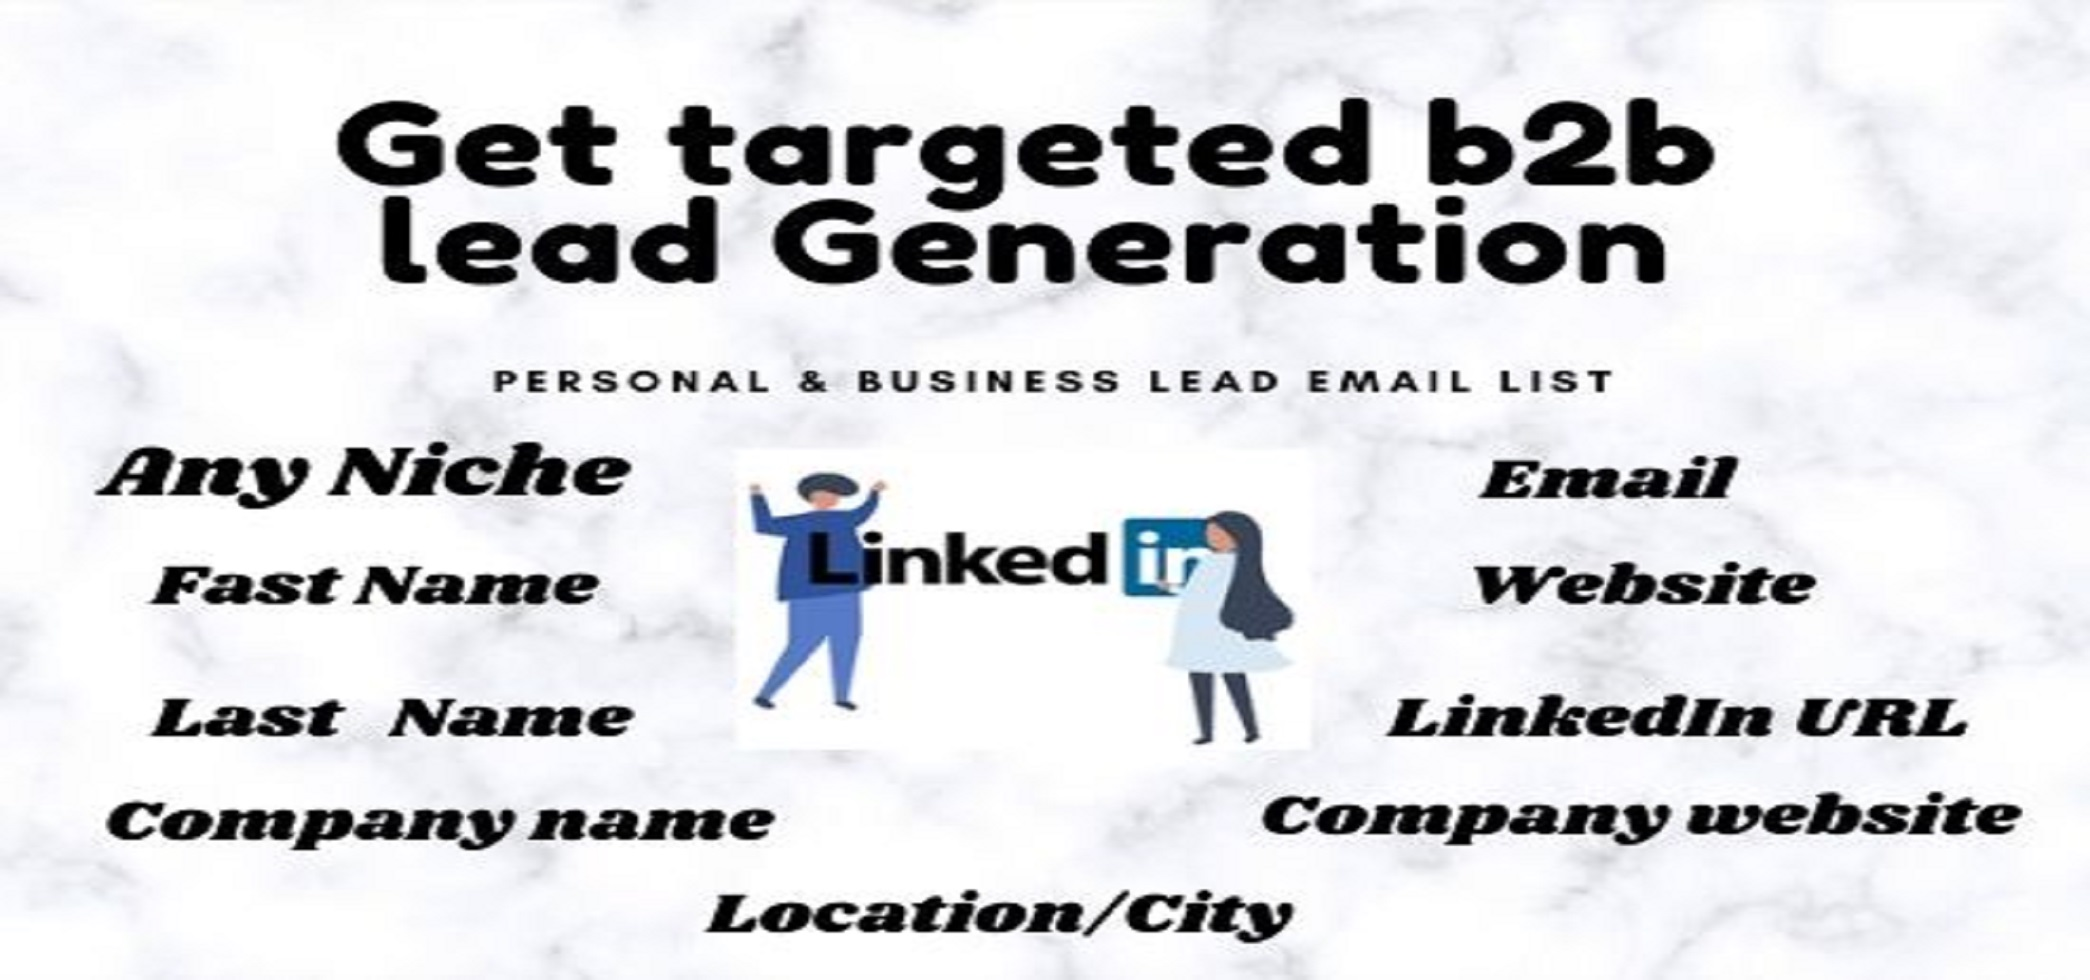 I will provide valid targeted b2b lead generation